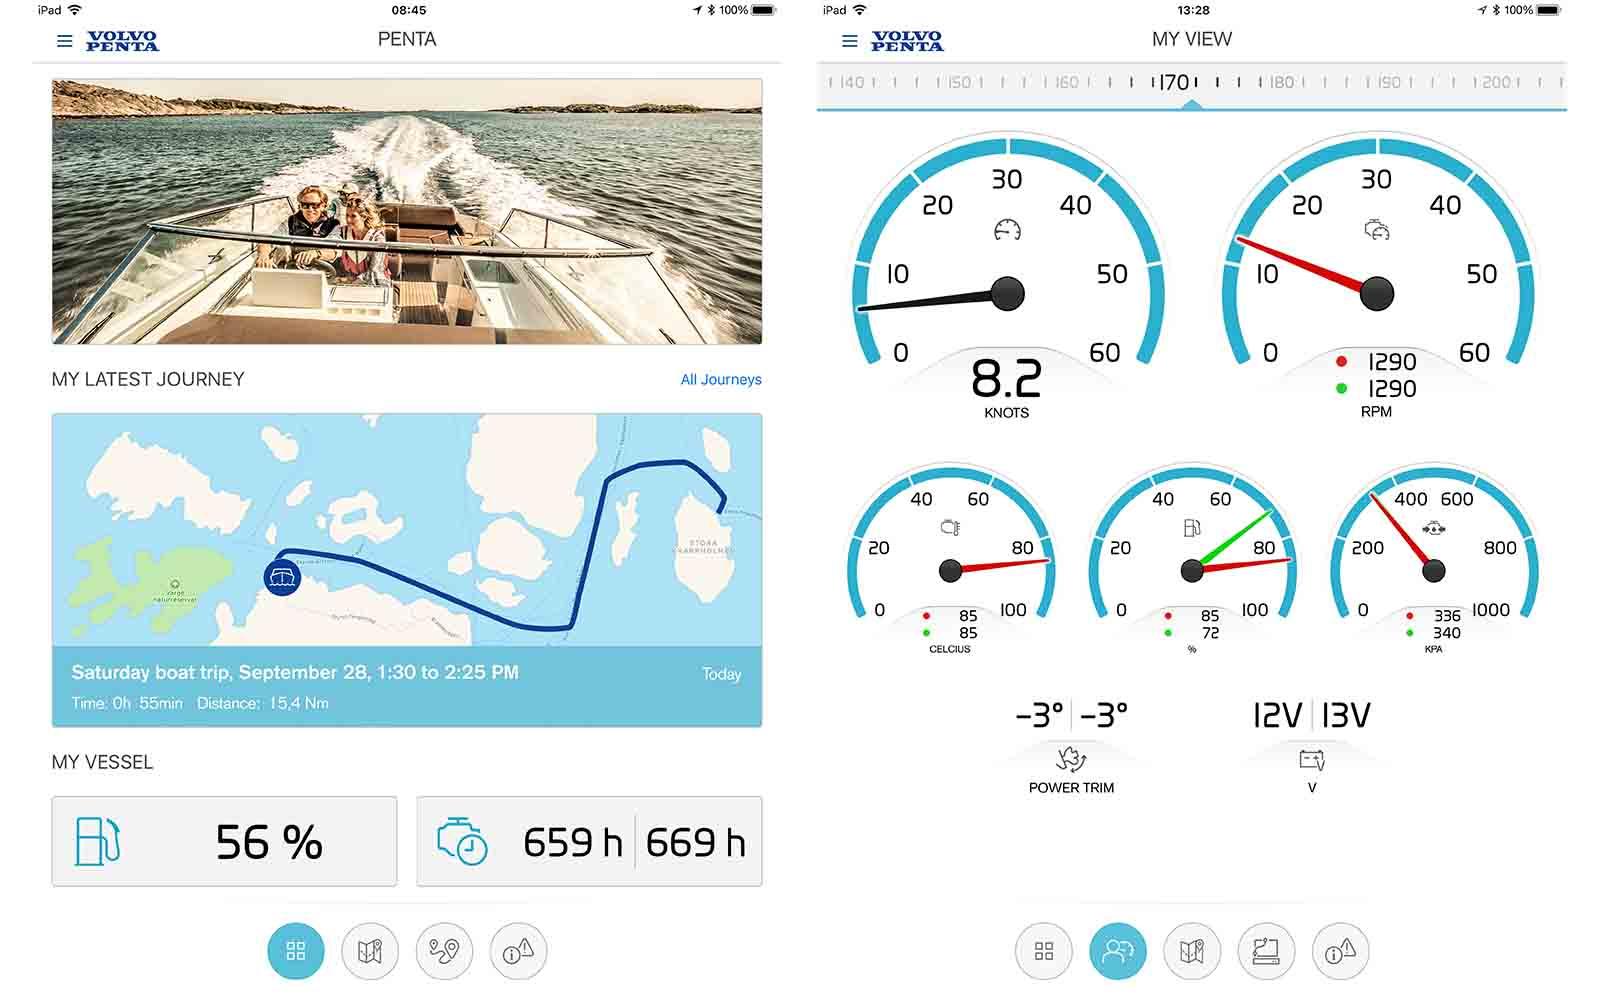 Easy Connect novo app volvo penta - boat shopping 4